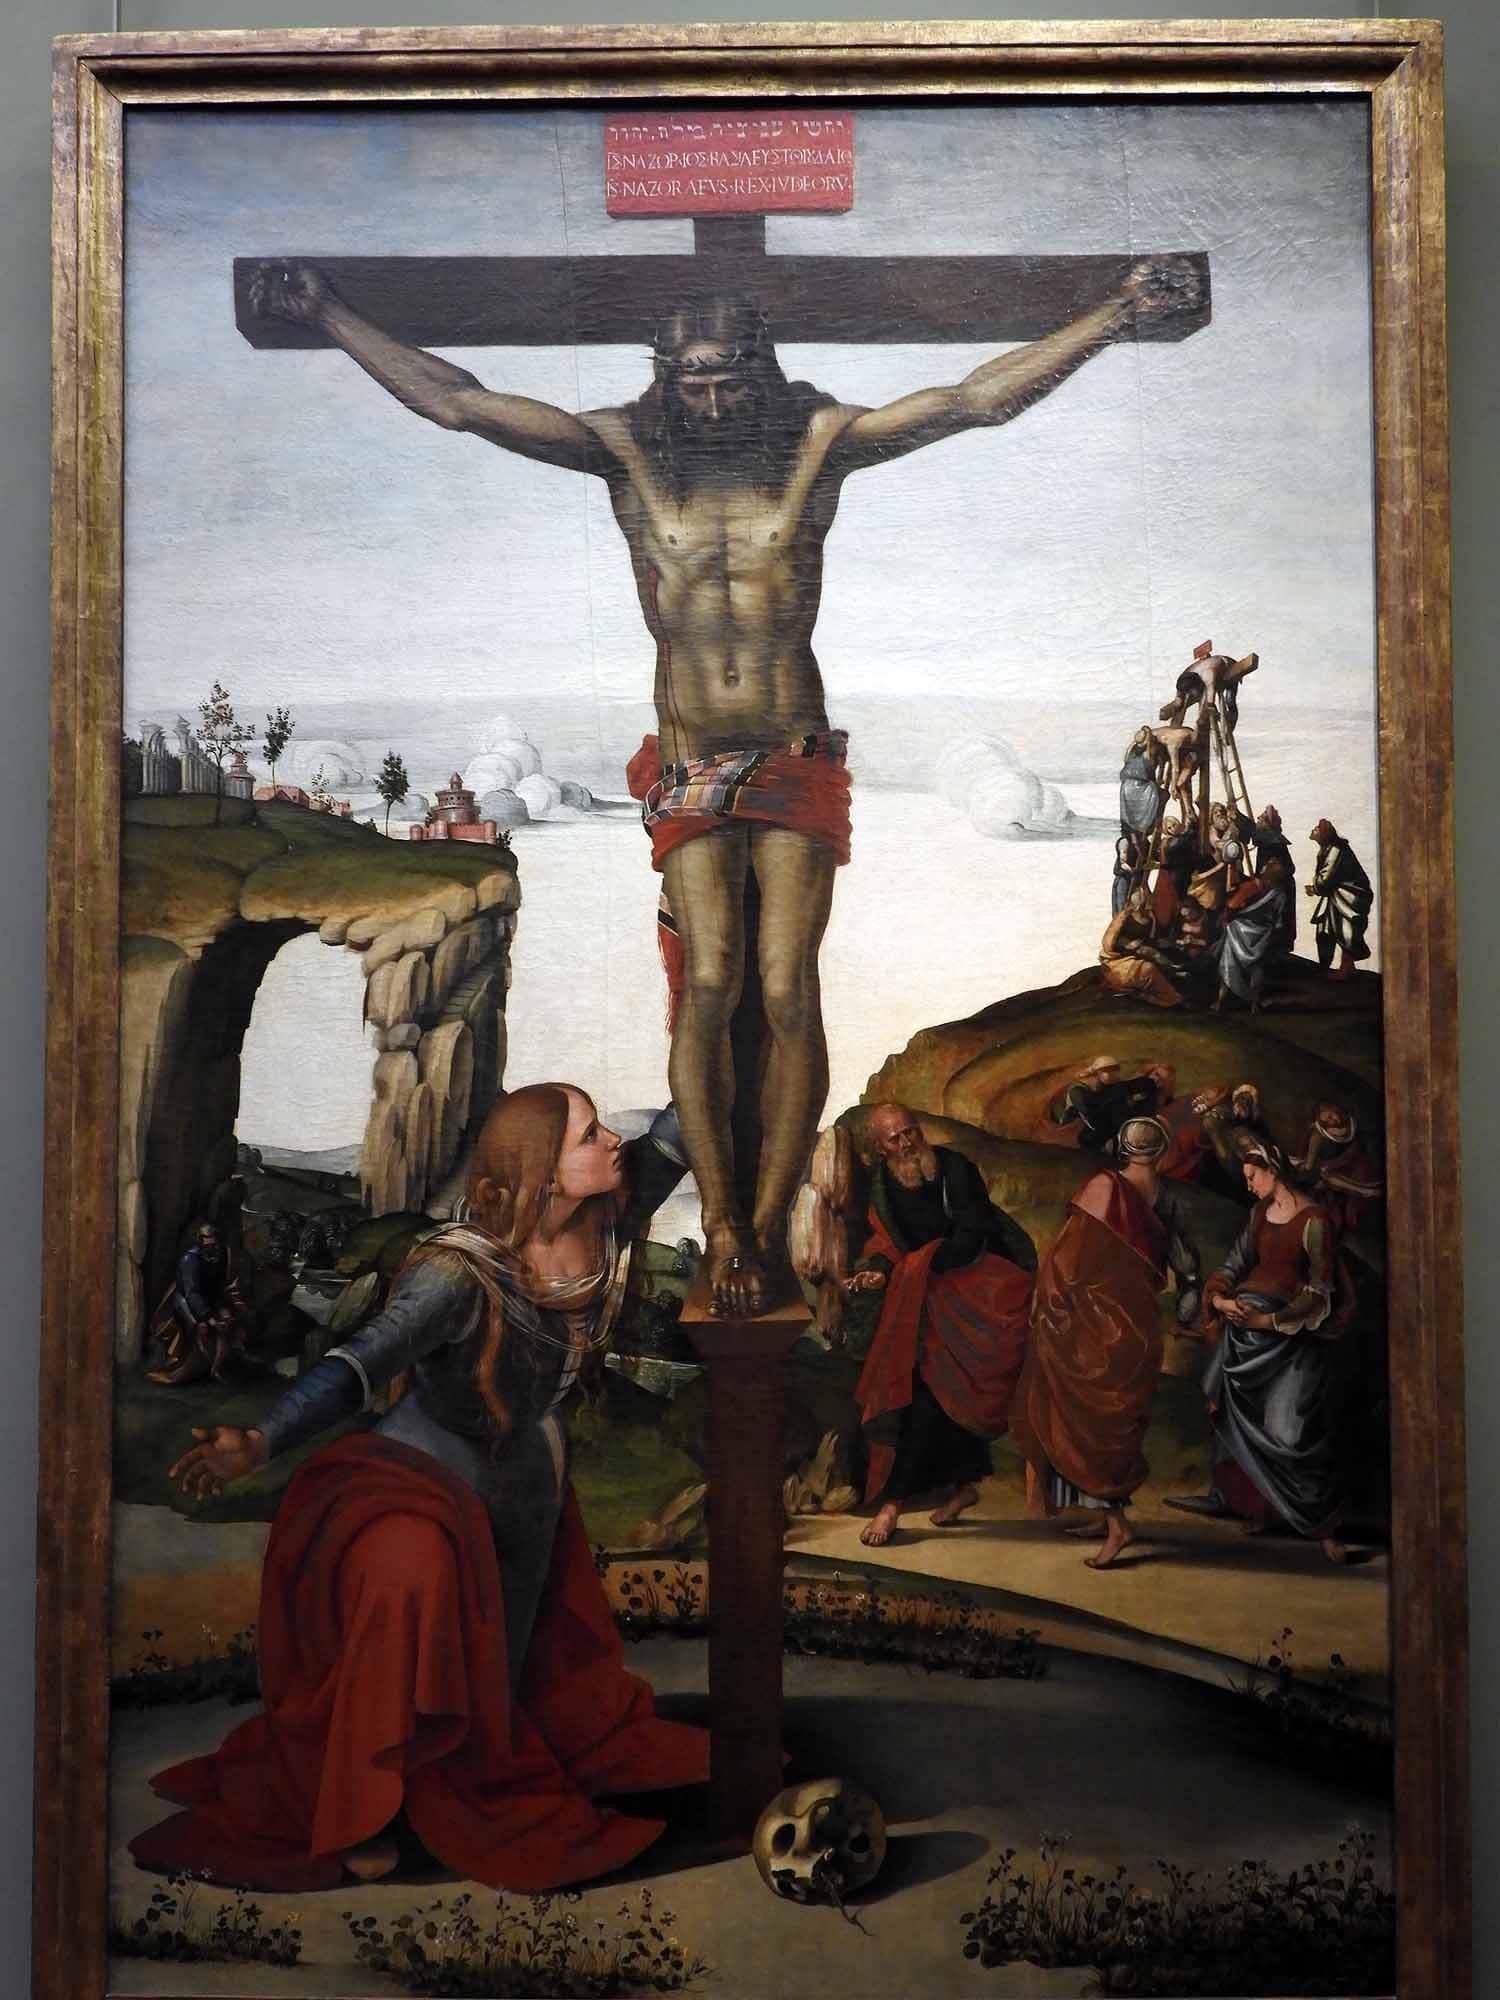 italy-italia-florence-uffizi-museum-renascaunce-painting-crucifix.JPG